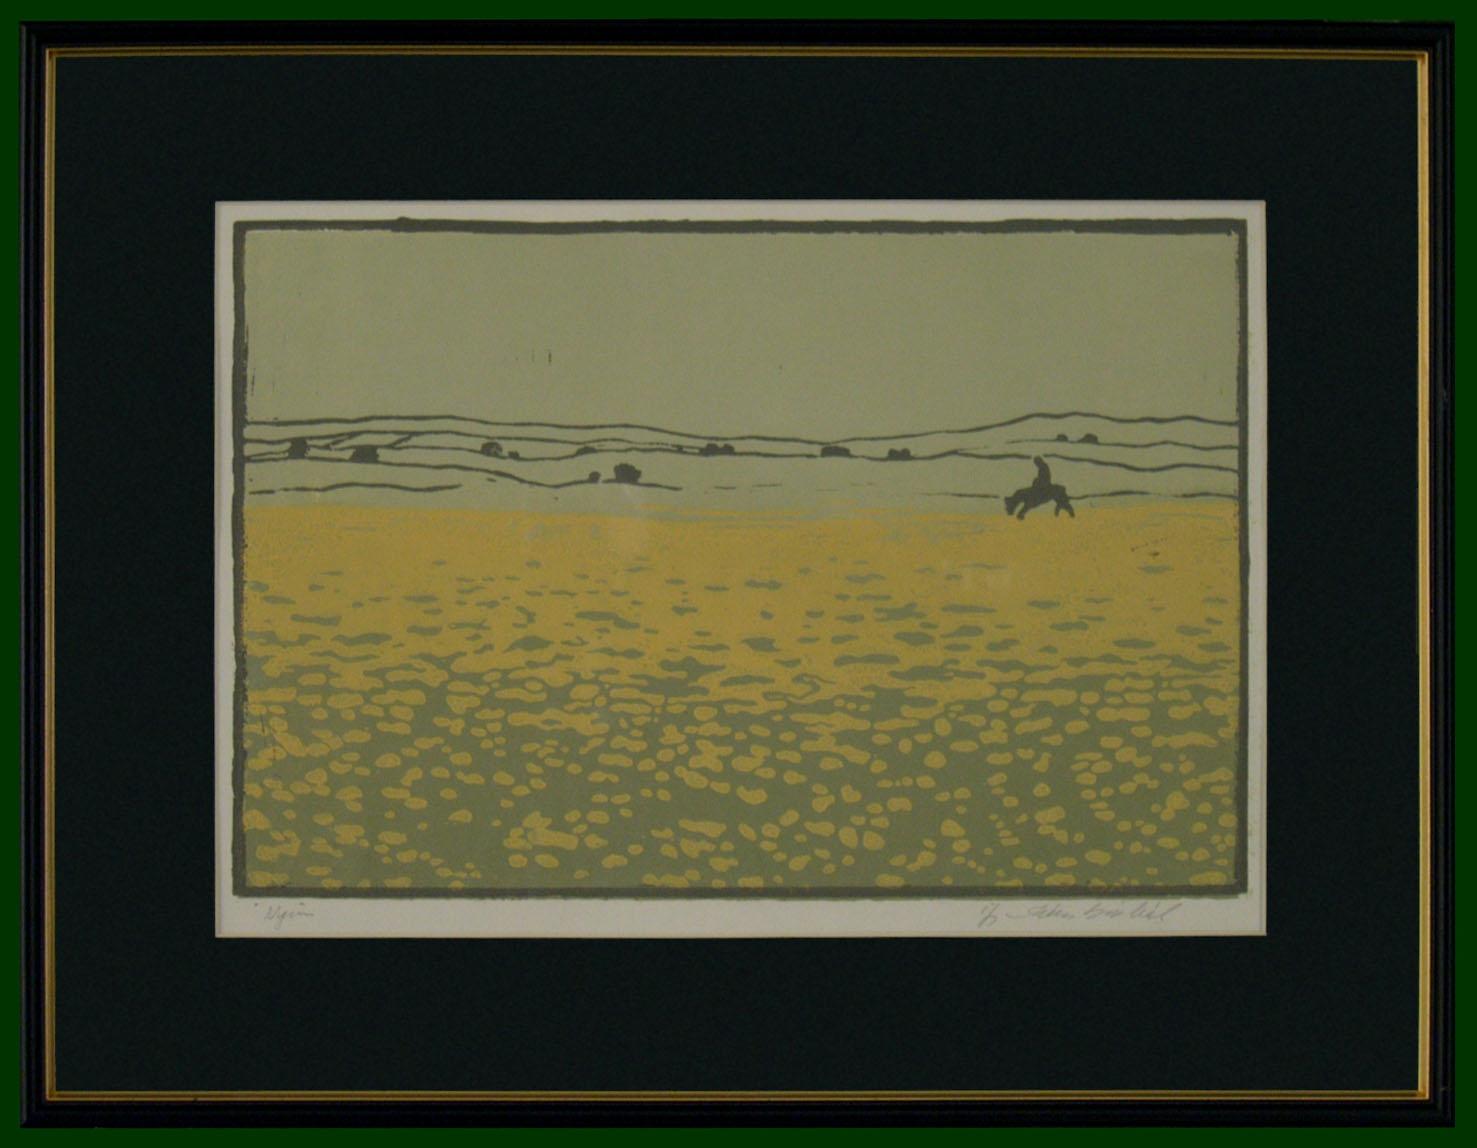 060-012k.JPG (1477×1148)